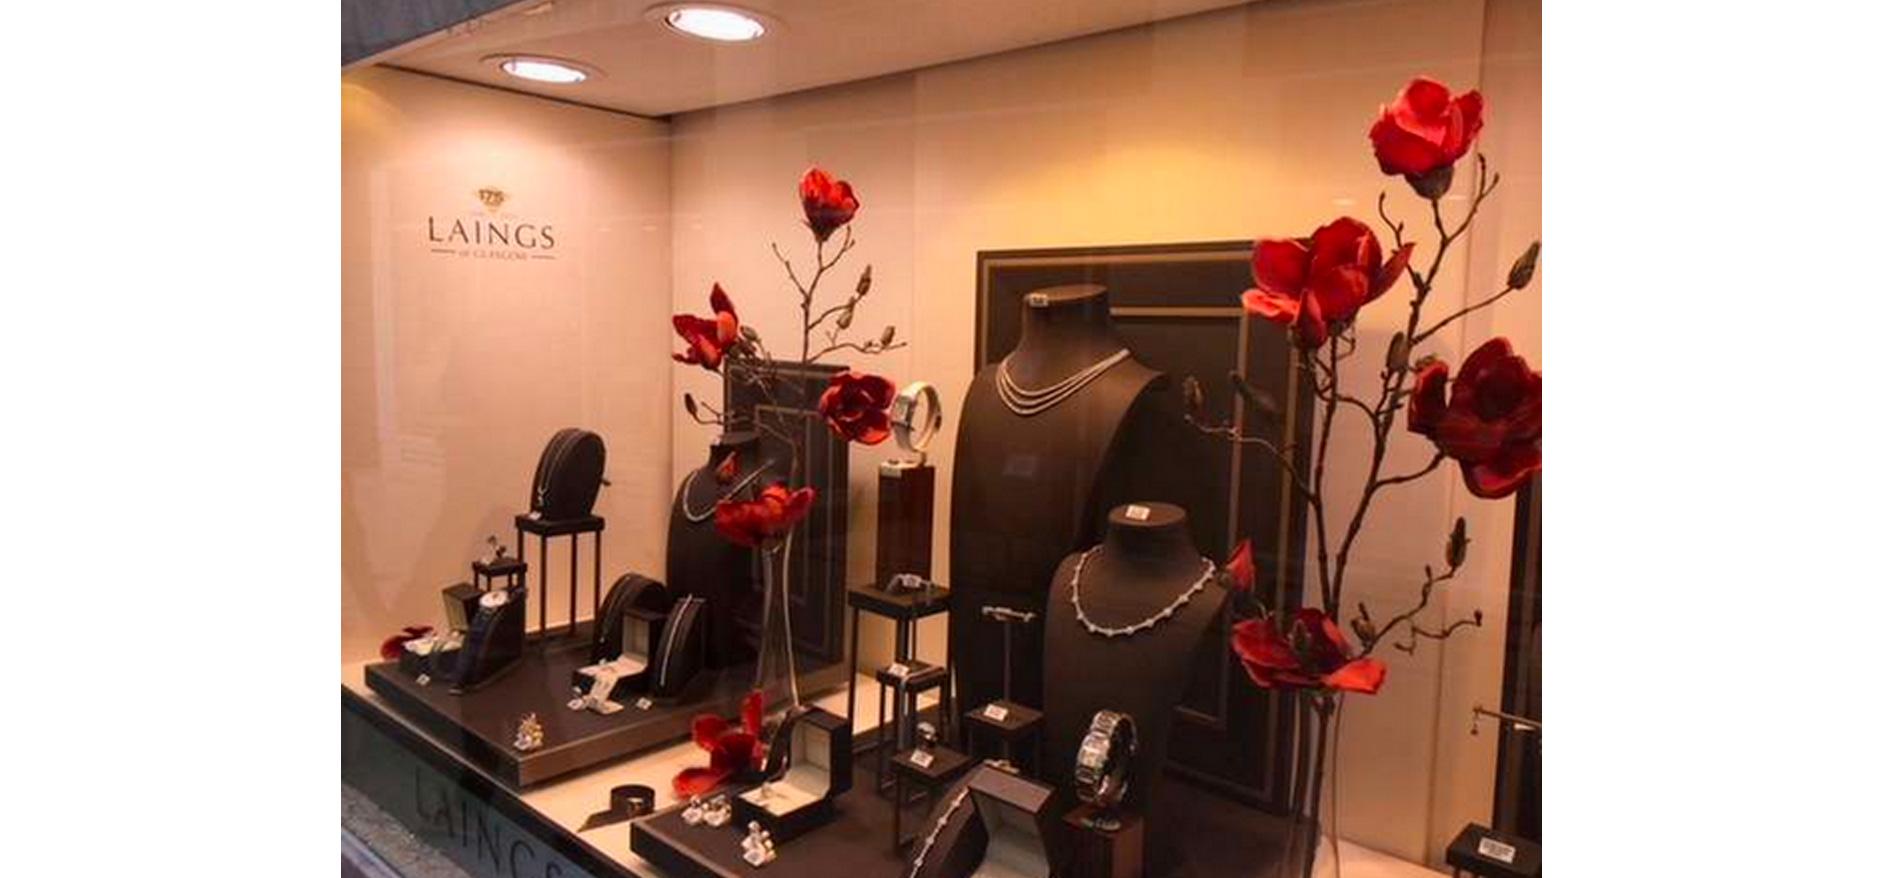 Red rose petal floral visual merchandising for Laings jewellery store